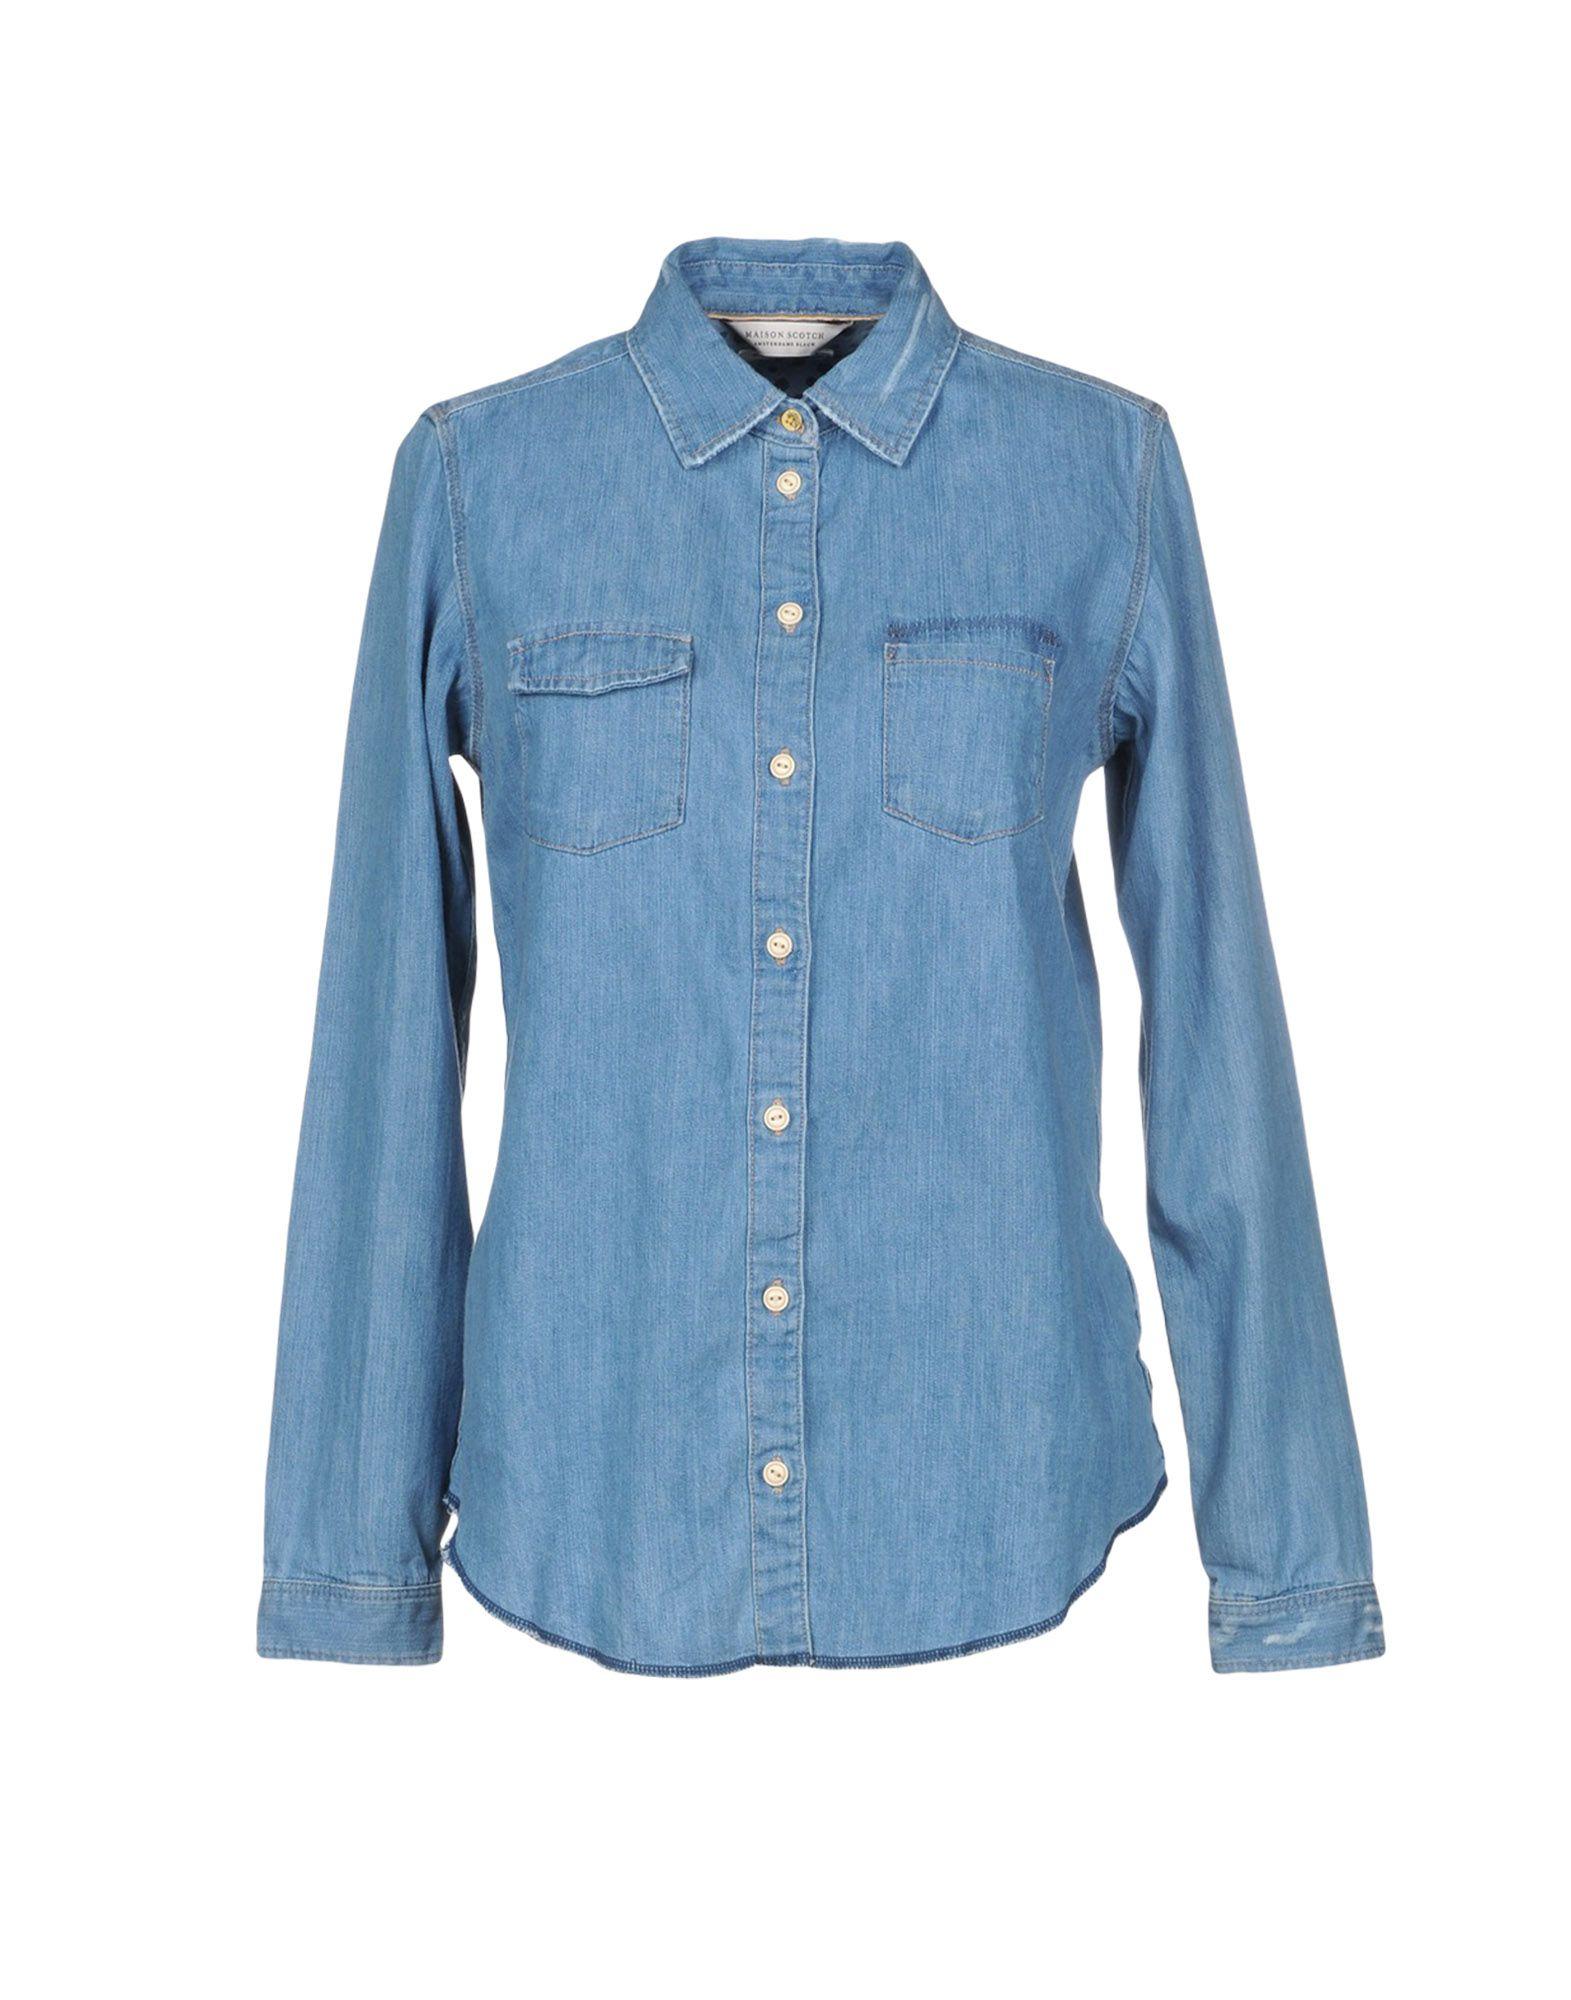 MAISON SCOTCH Джинсовая рубашка maison scotch рубашка maison scotch 133 1621 0120131137 03 page 4